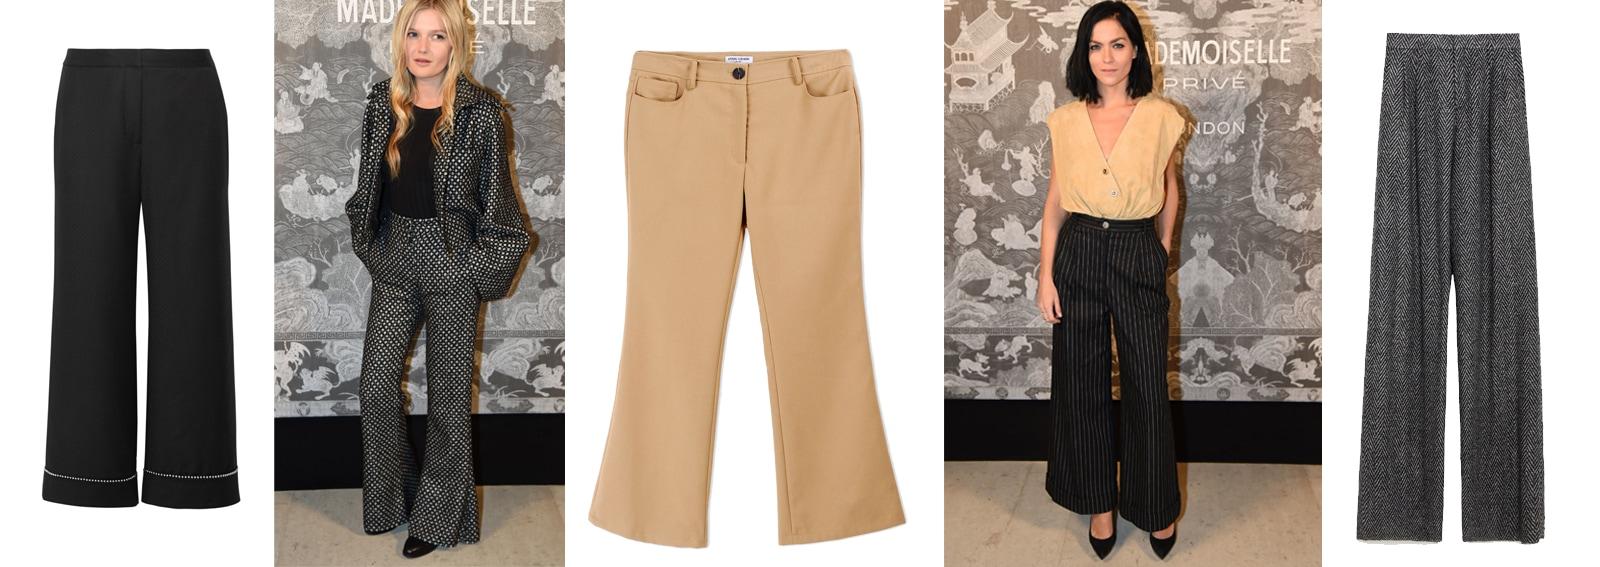 cover-flare-pants-DESKTOP